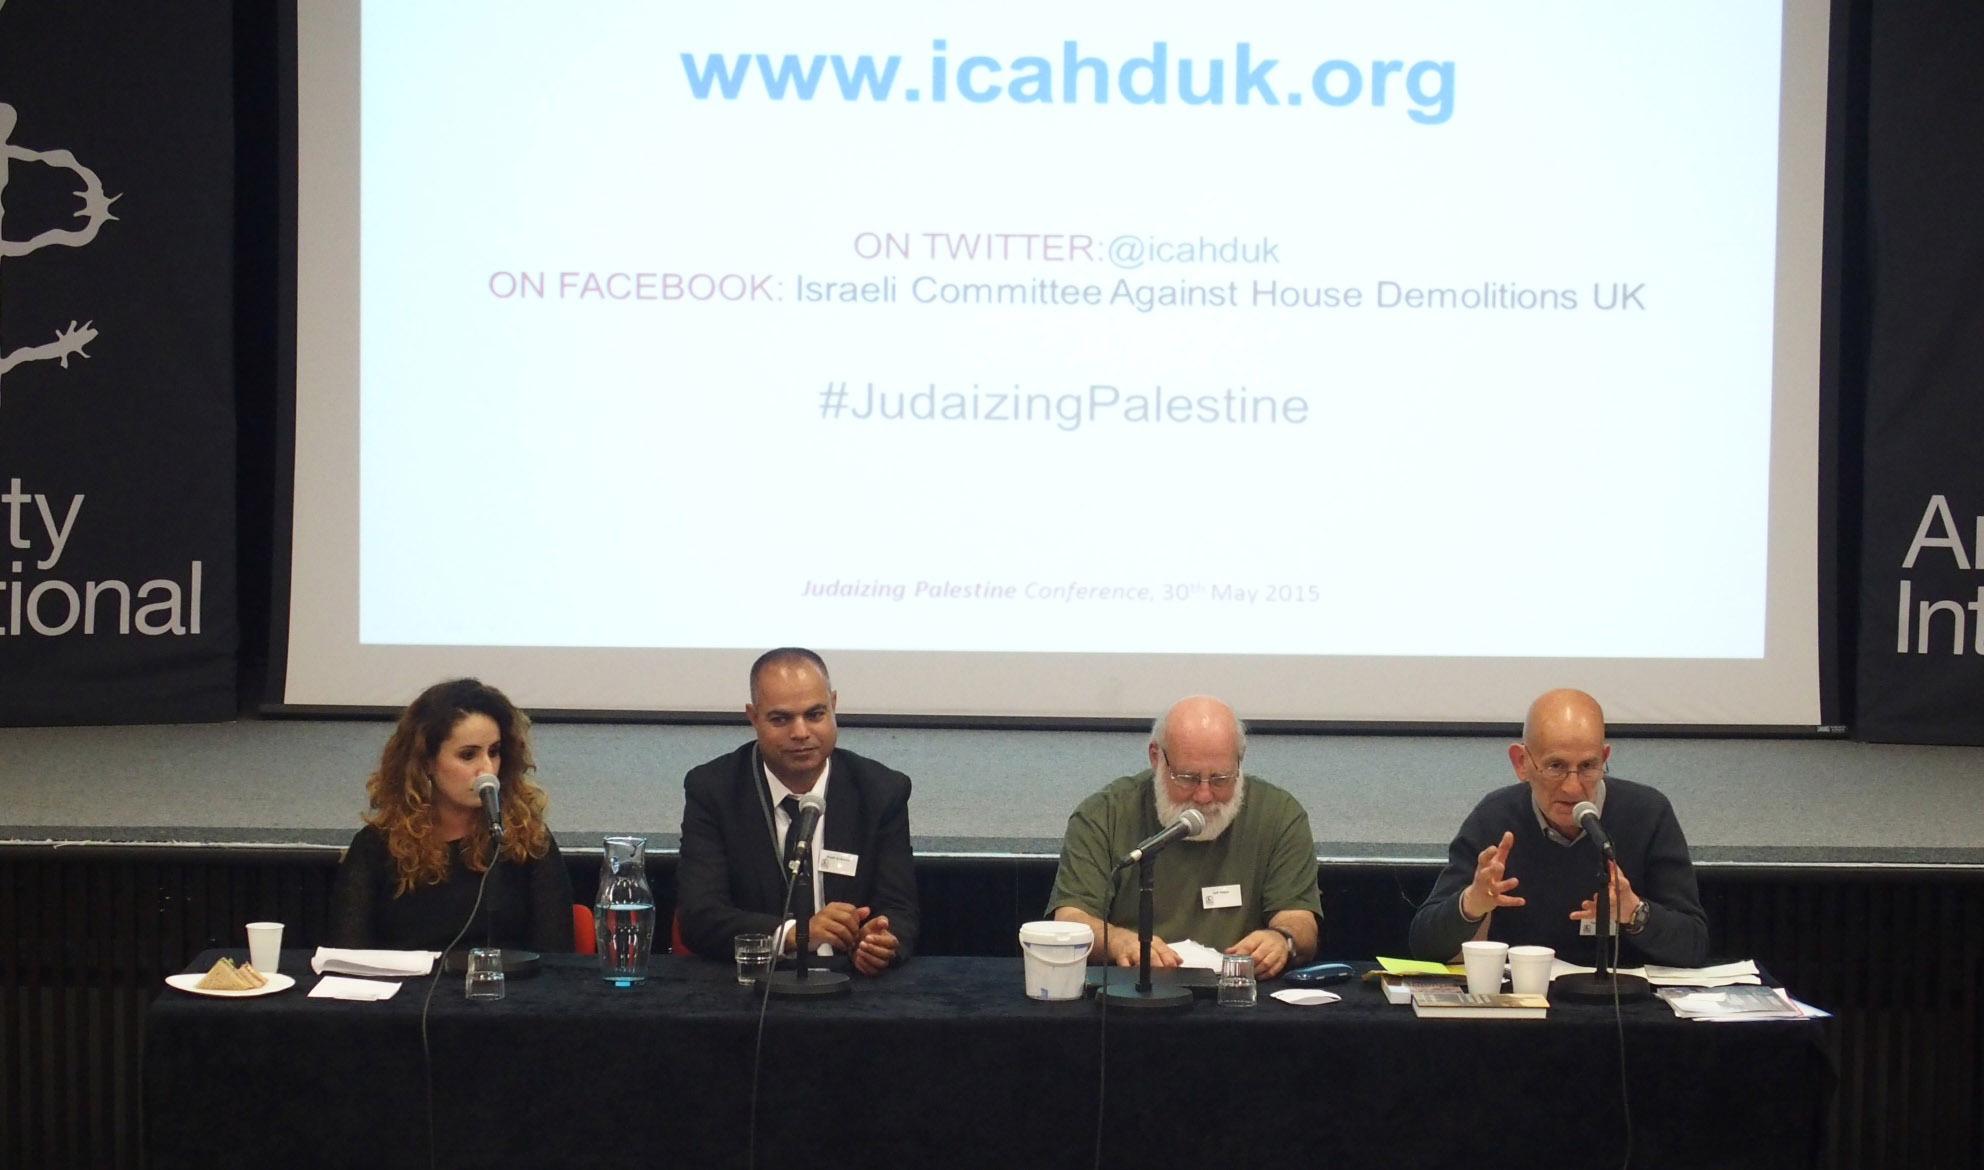 Salma Karmi Ayyoub, Khalil AlAmour, Jeff Halper, & Anthony Lerman